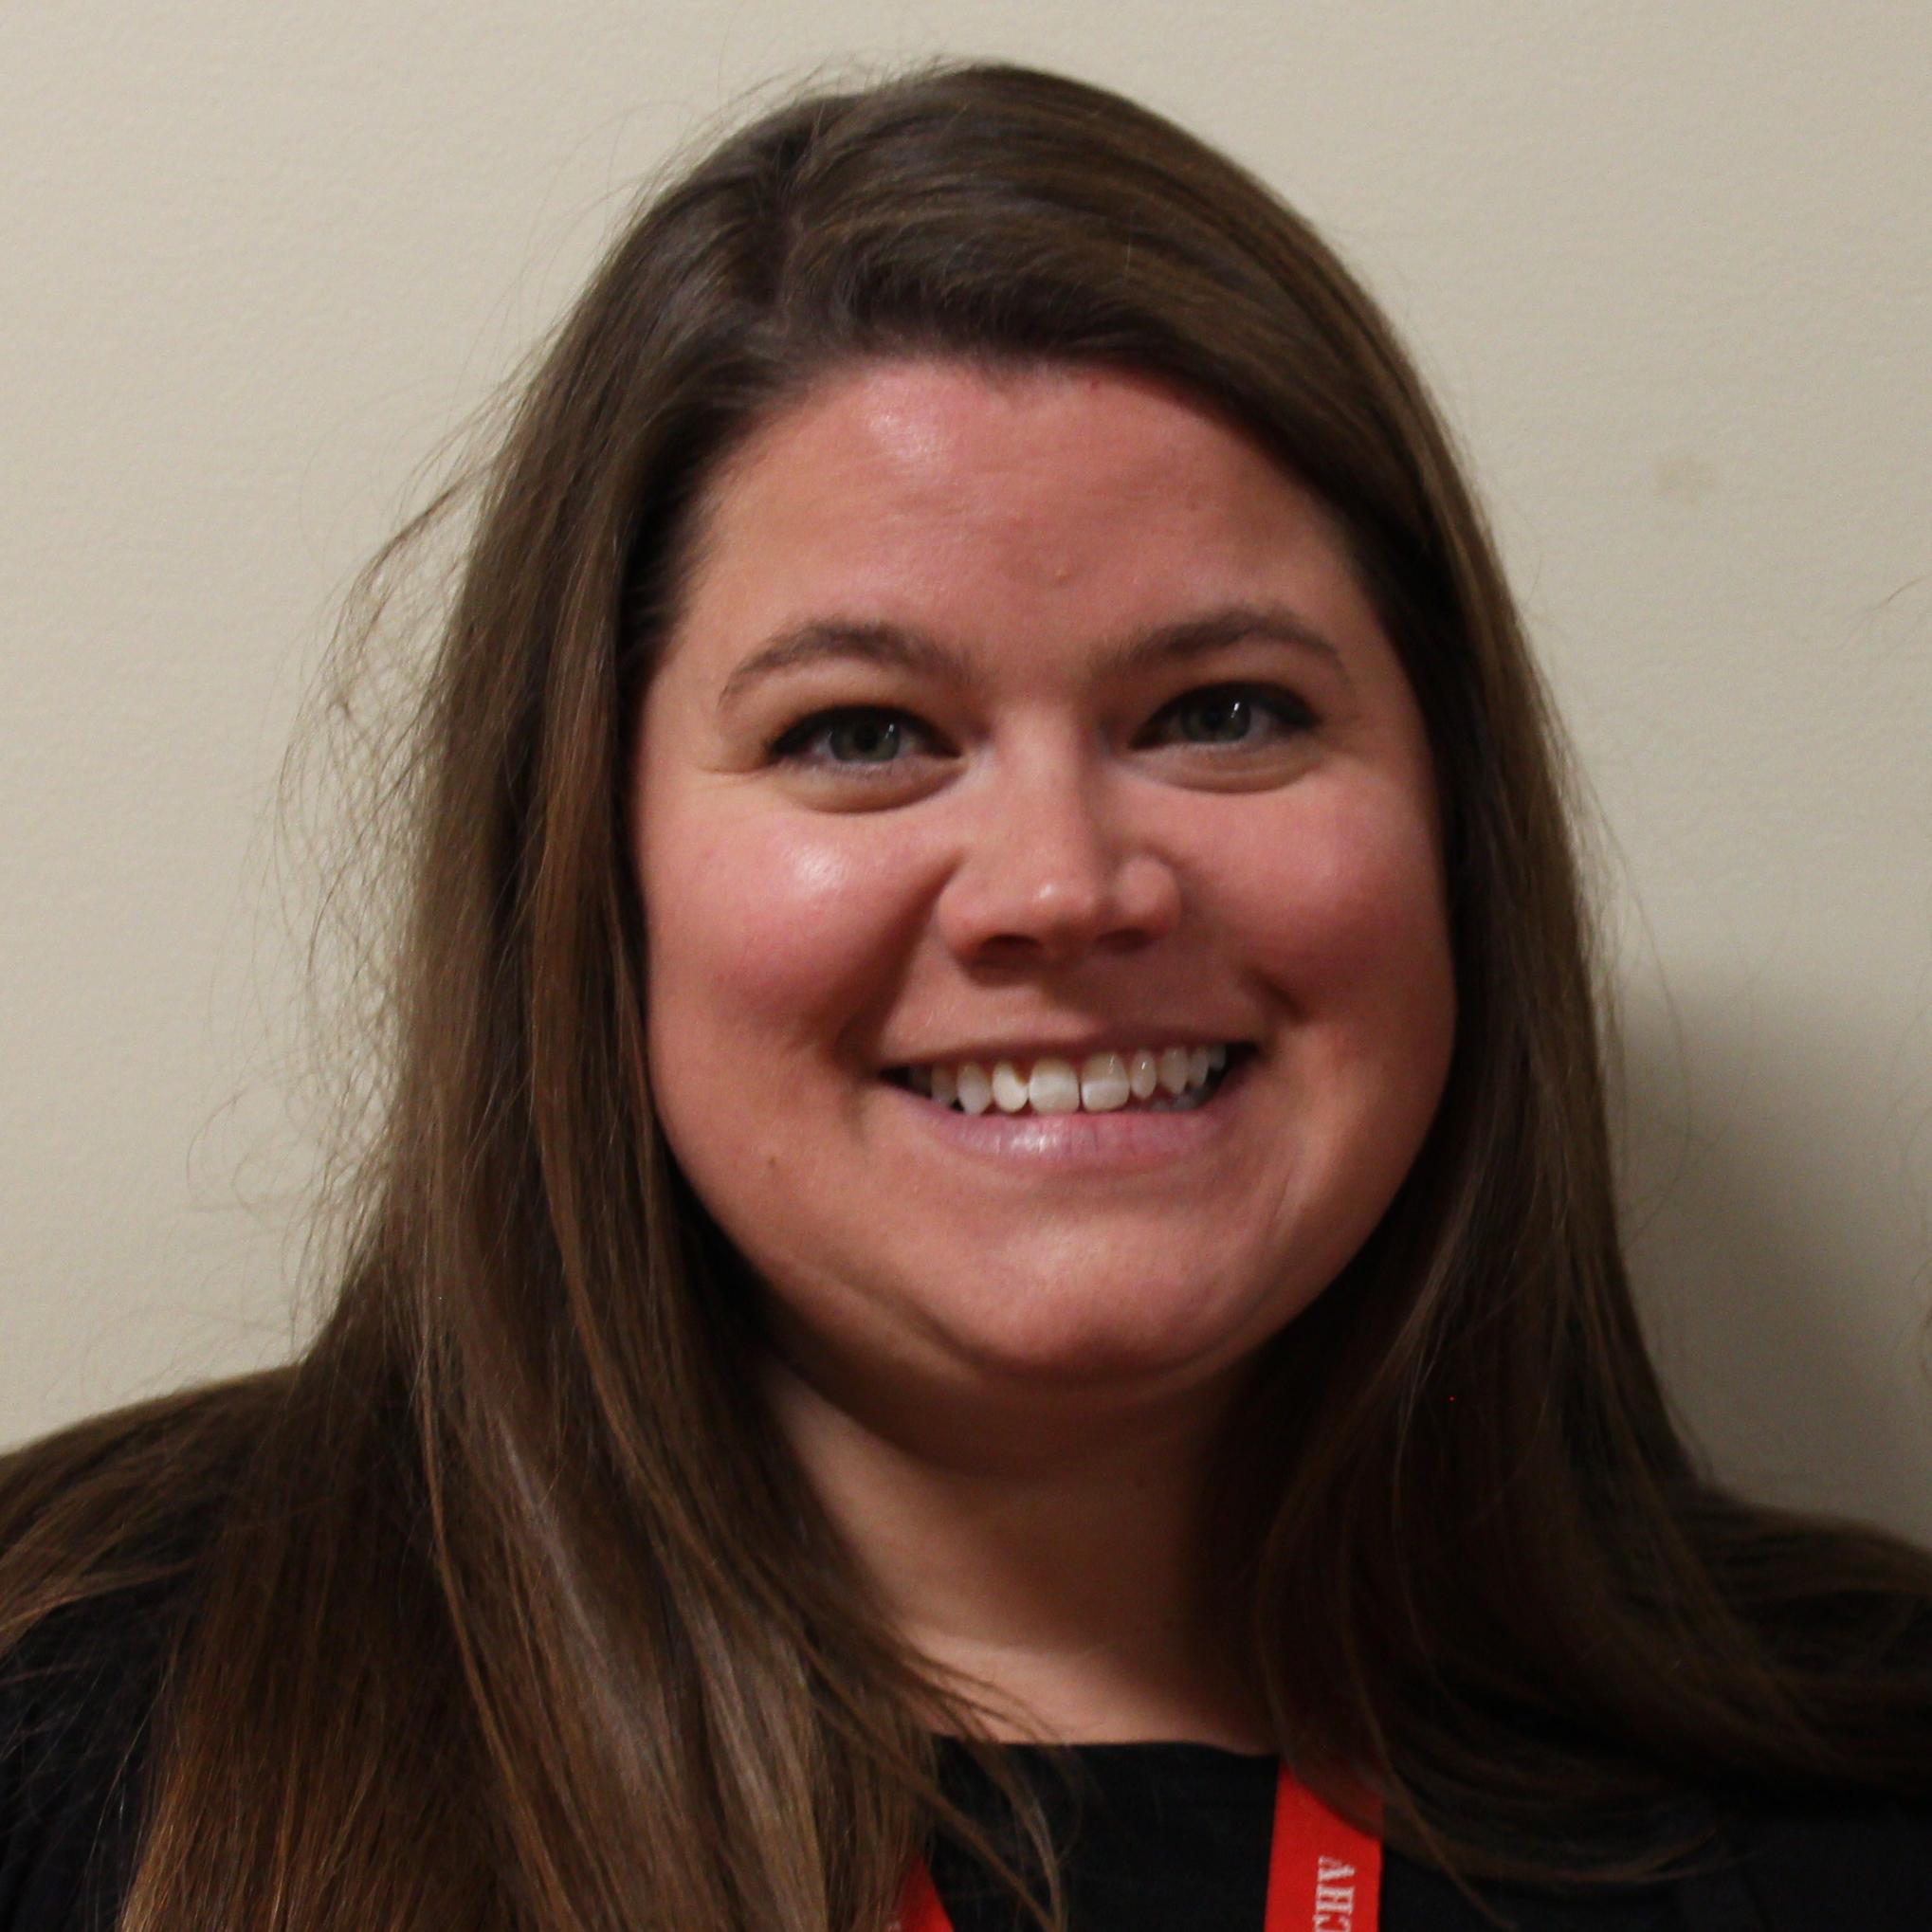 Katie Burnham Wilkins